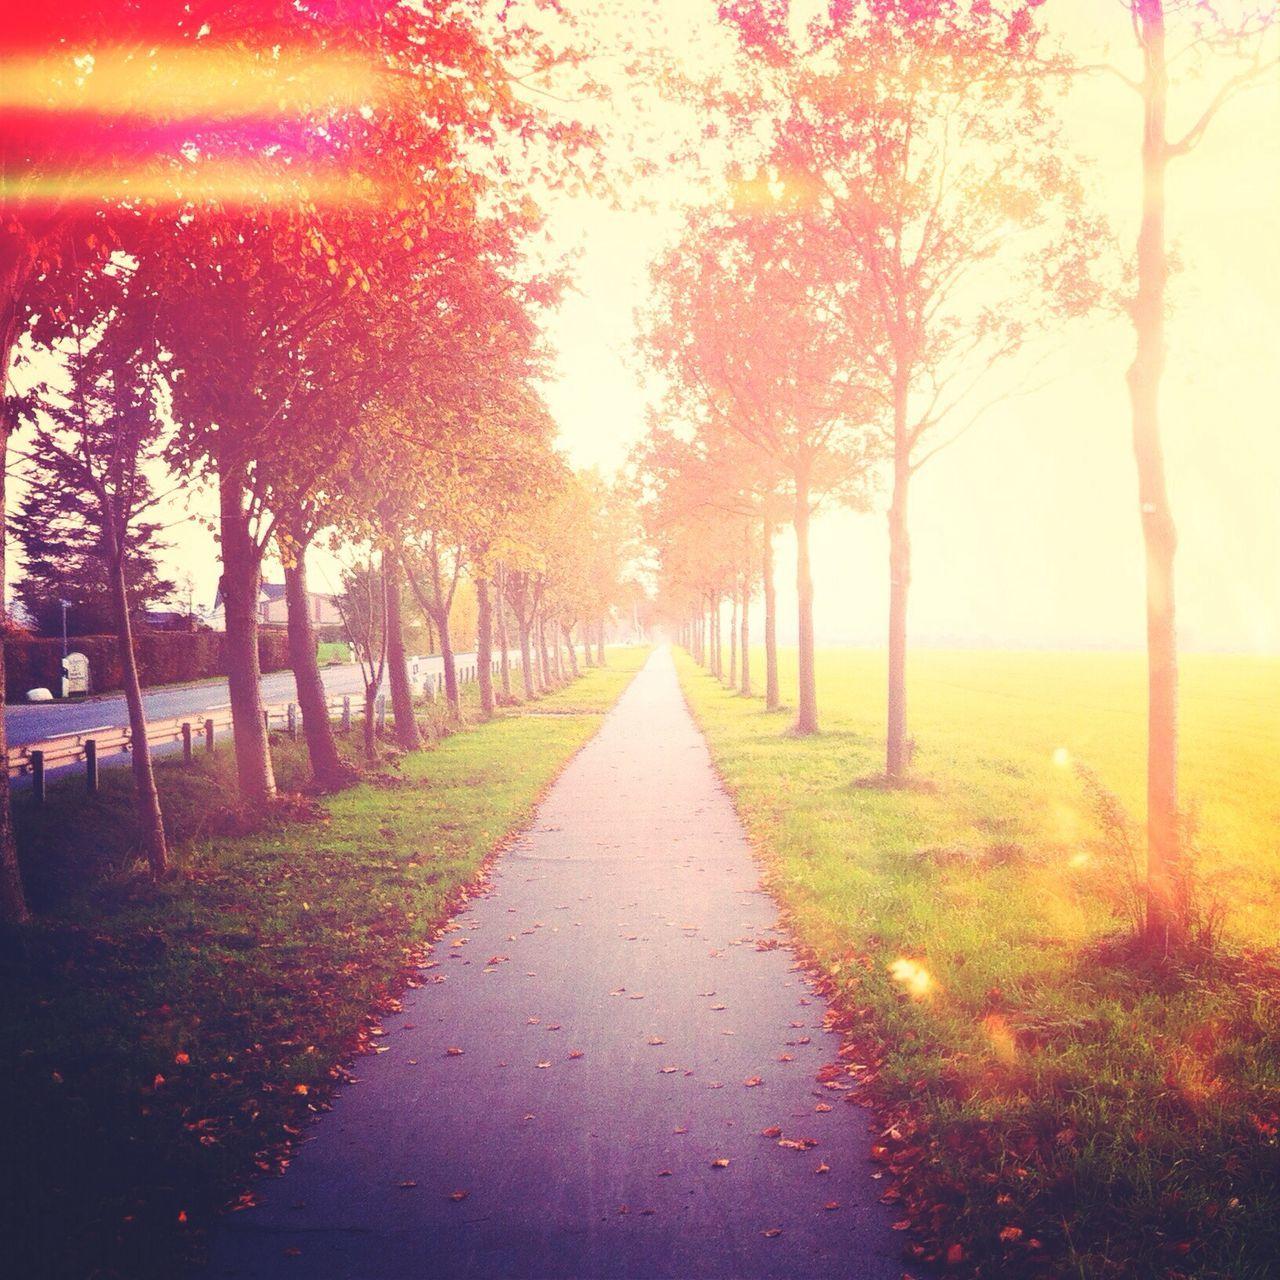 Narrow Pathway Along Trees On Landscape